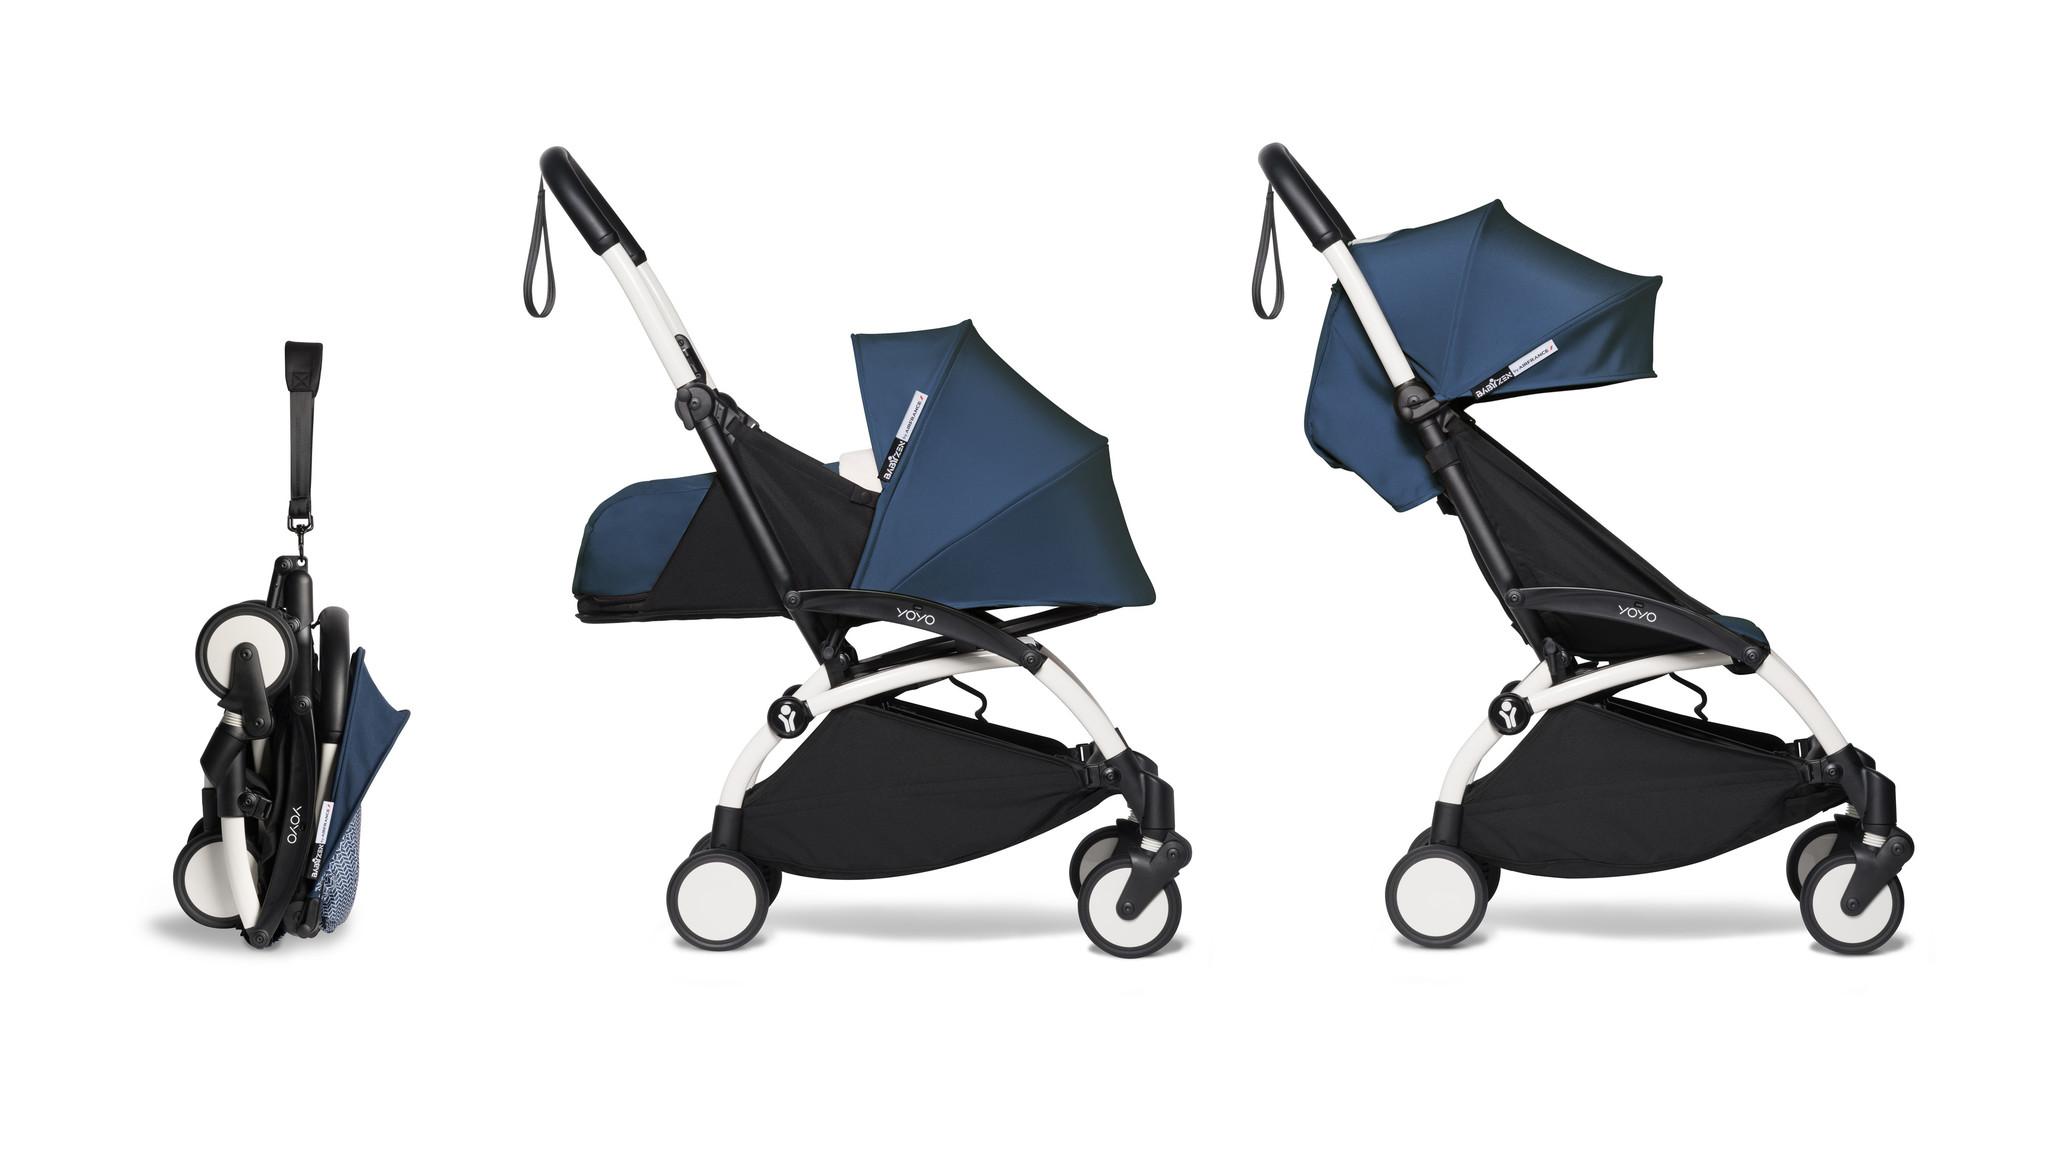 Babyzen Babyzen YOYO² buggy COMPLEET / FULL SET 0+ and 6+ navy AirFrance frame wit